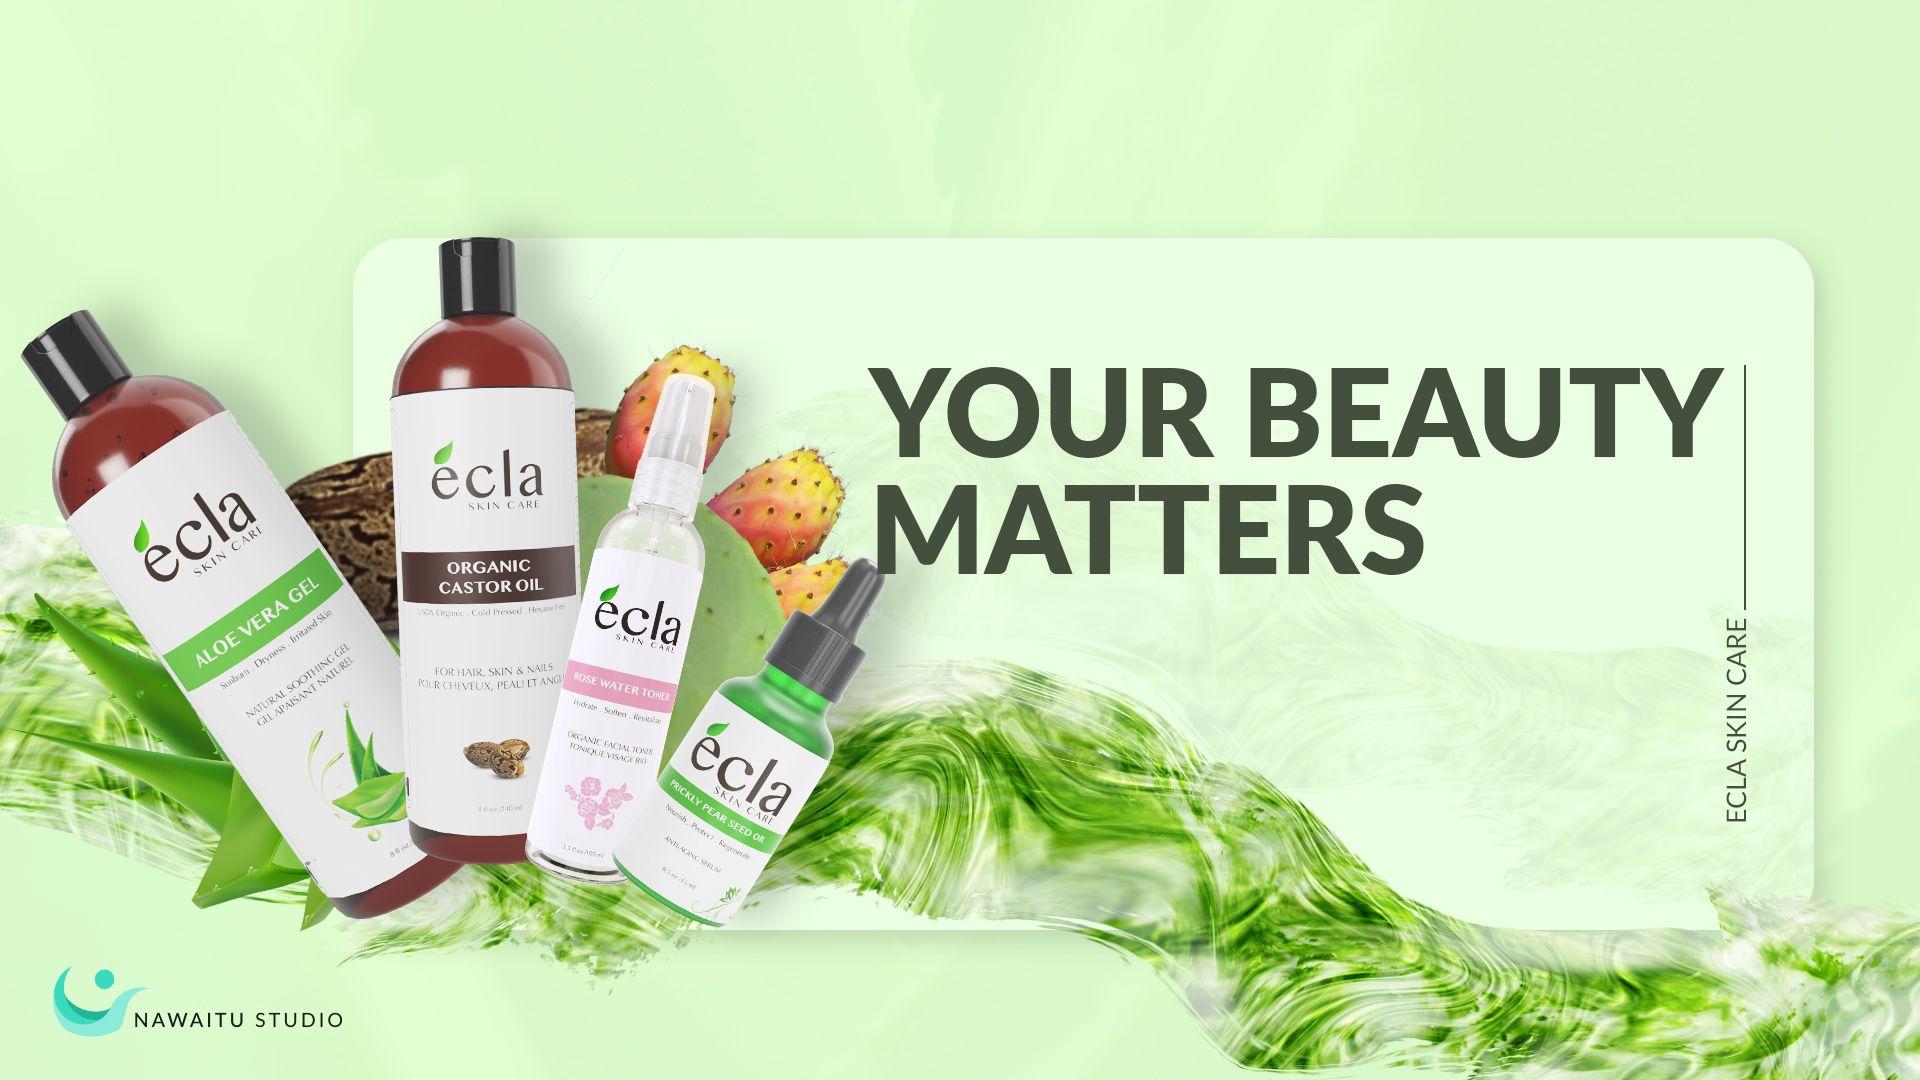 Ecla Skin Care Banner Ads Banner Webbanner Eclaskincare Skincare Productads Productbanner Fiverr Graphicdesign Banner Bu Banner Ads Skin Cure Banner